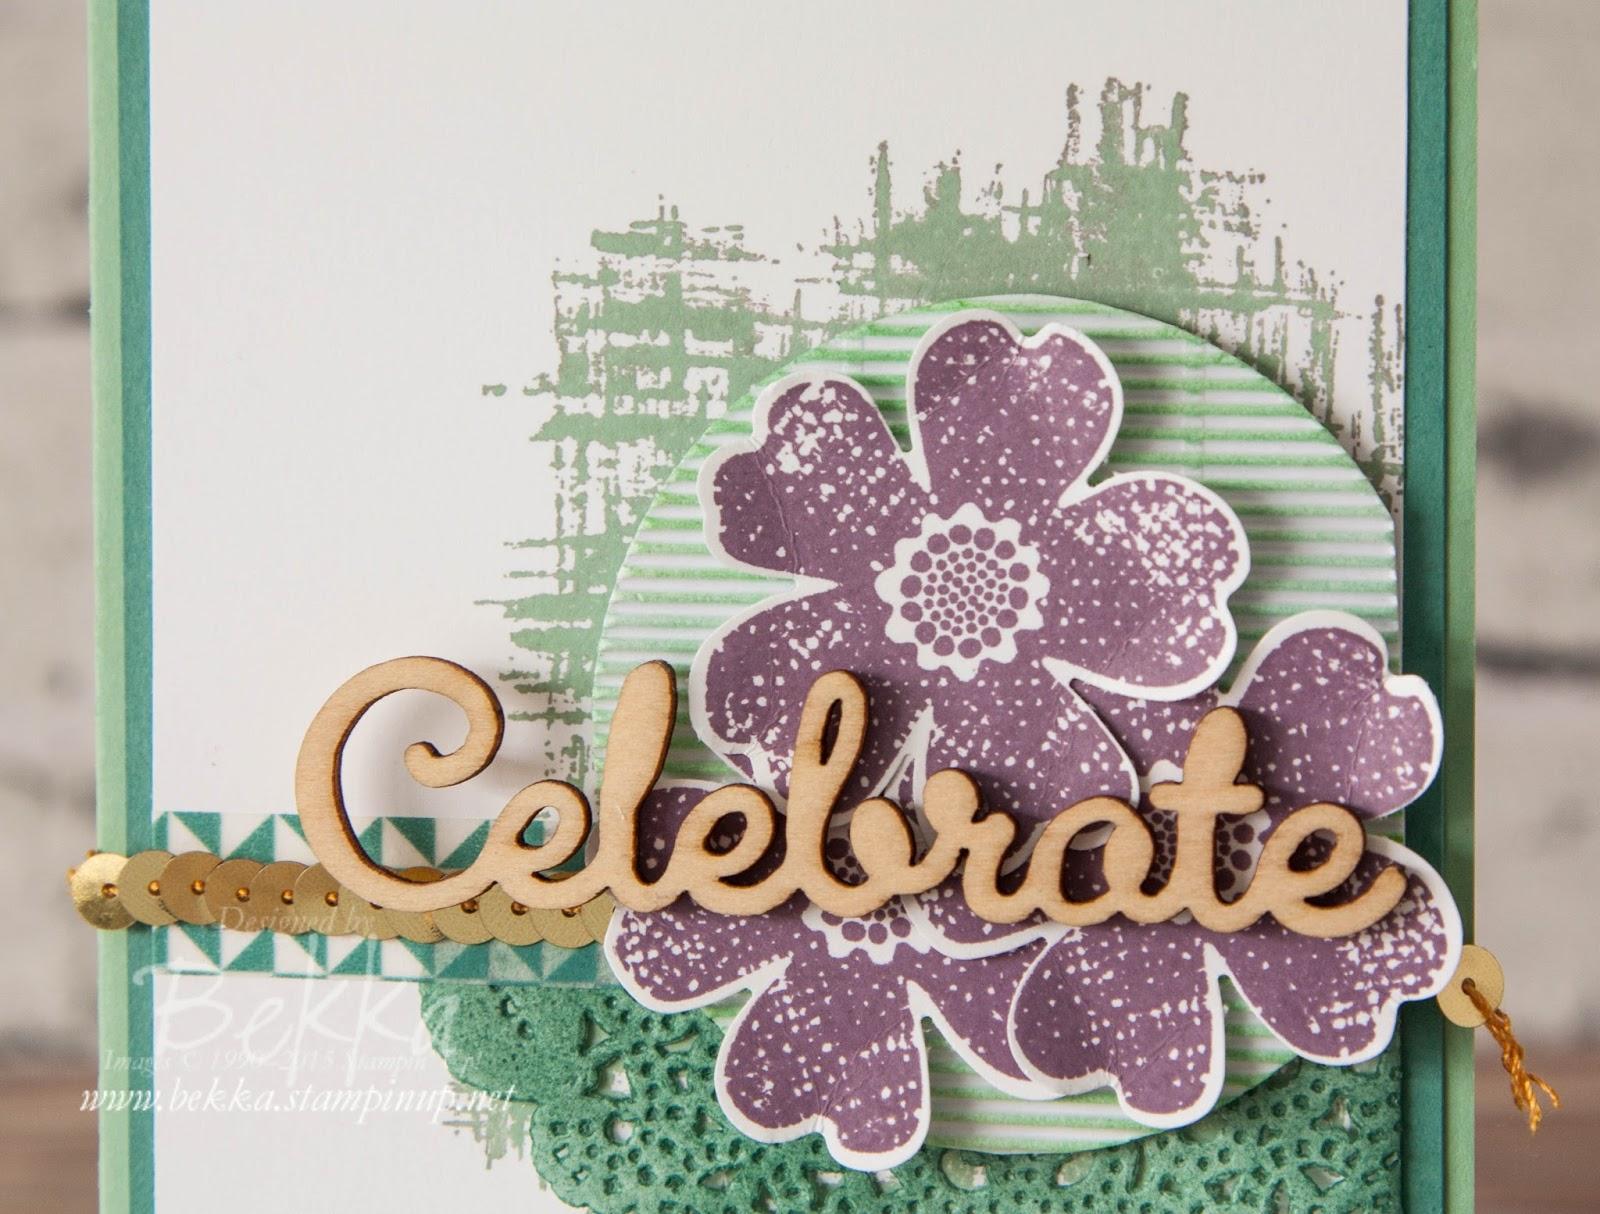 december birthday flower - HD1600×1214